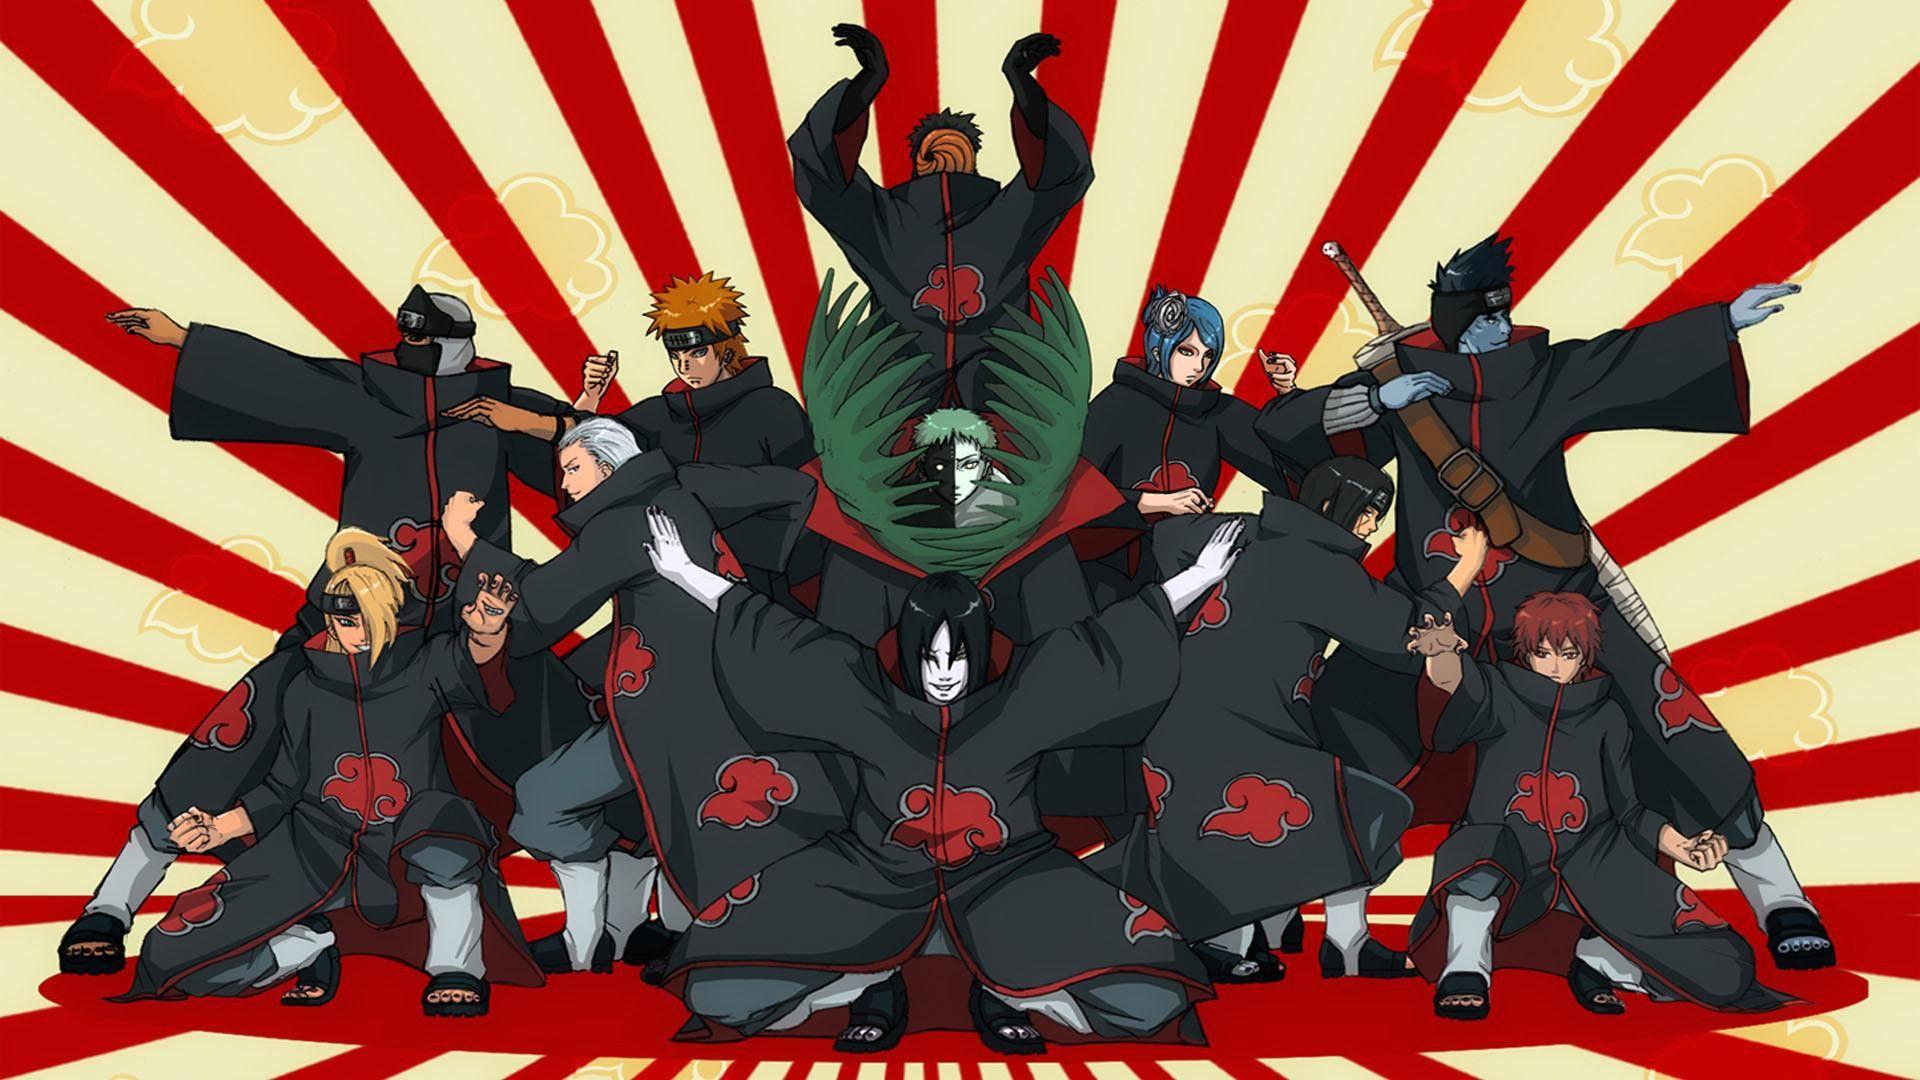 Akatsuki Wallpaper Luxury Akatsuki Hd Wallpapers Akatsuki Cool Anime Wallpapers Anime